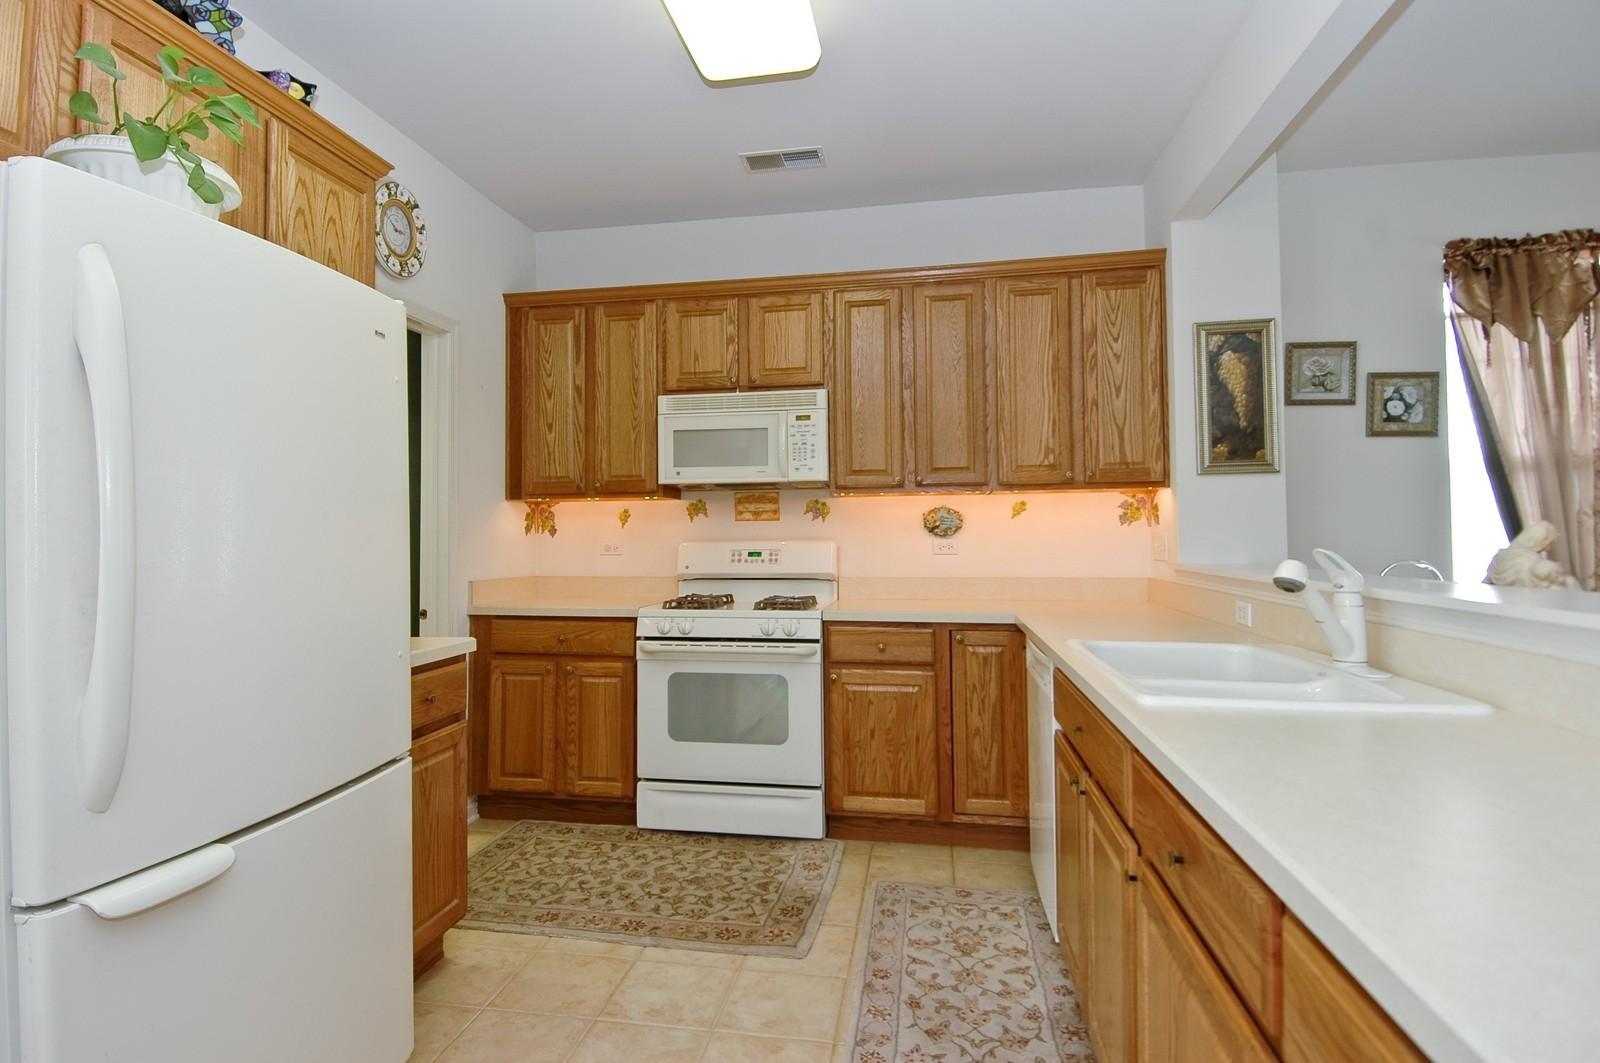 Real Estate Photography - 12206 Latham Trl, Huntley, IL, 60142 - Kitchen